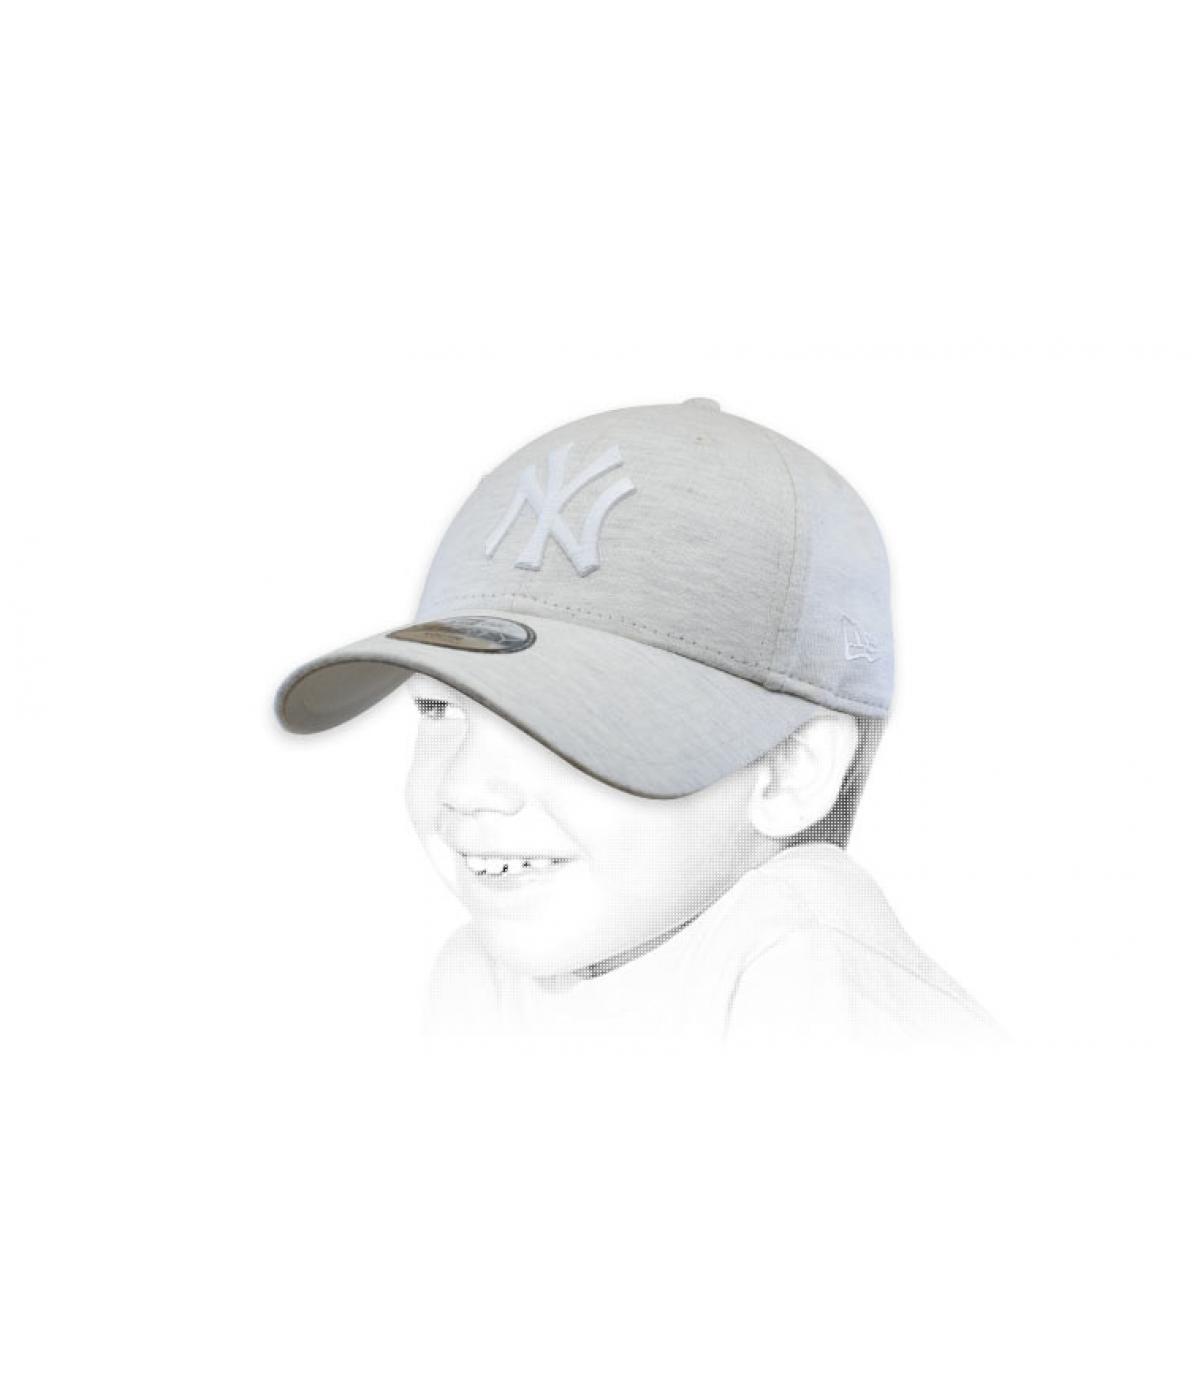 Kinder Cap beige NY